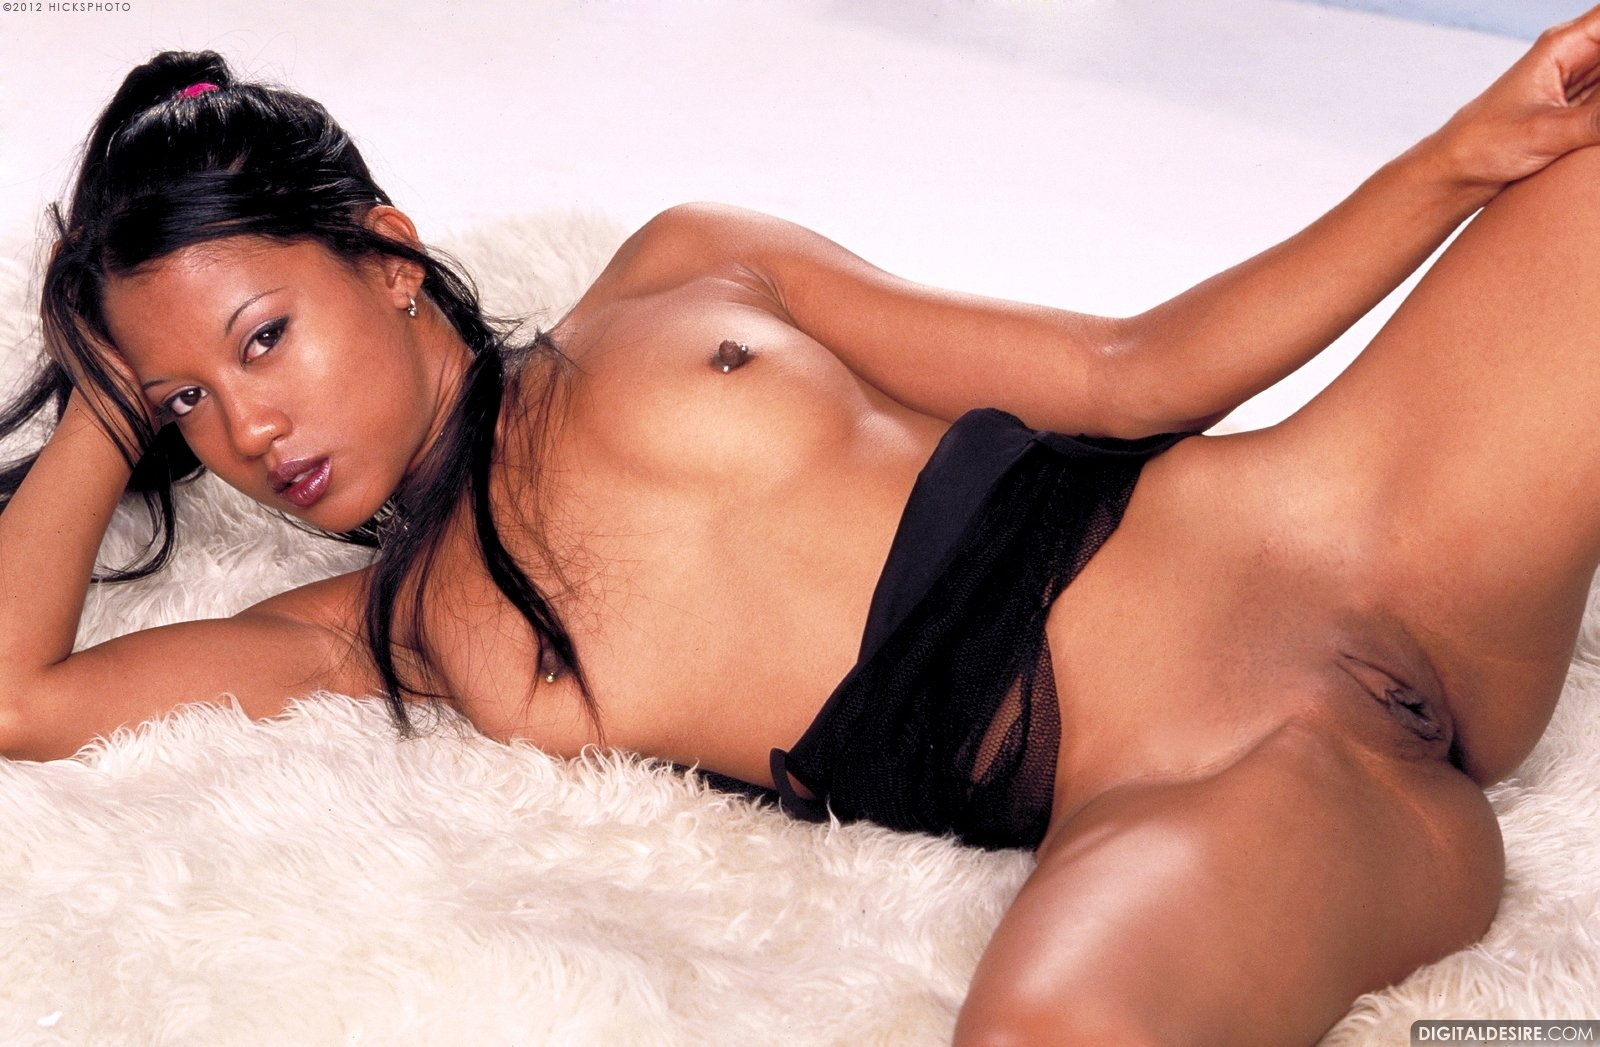 sexy pornstar lily thai awkward family boners nude pics